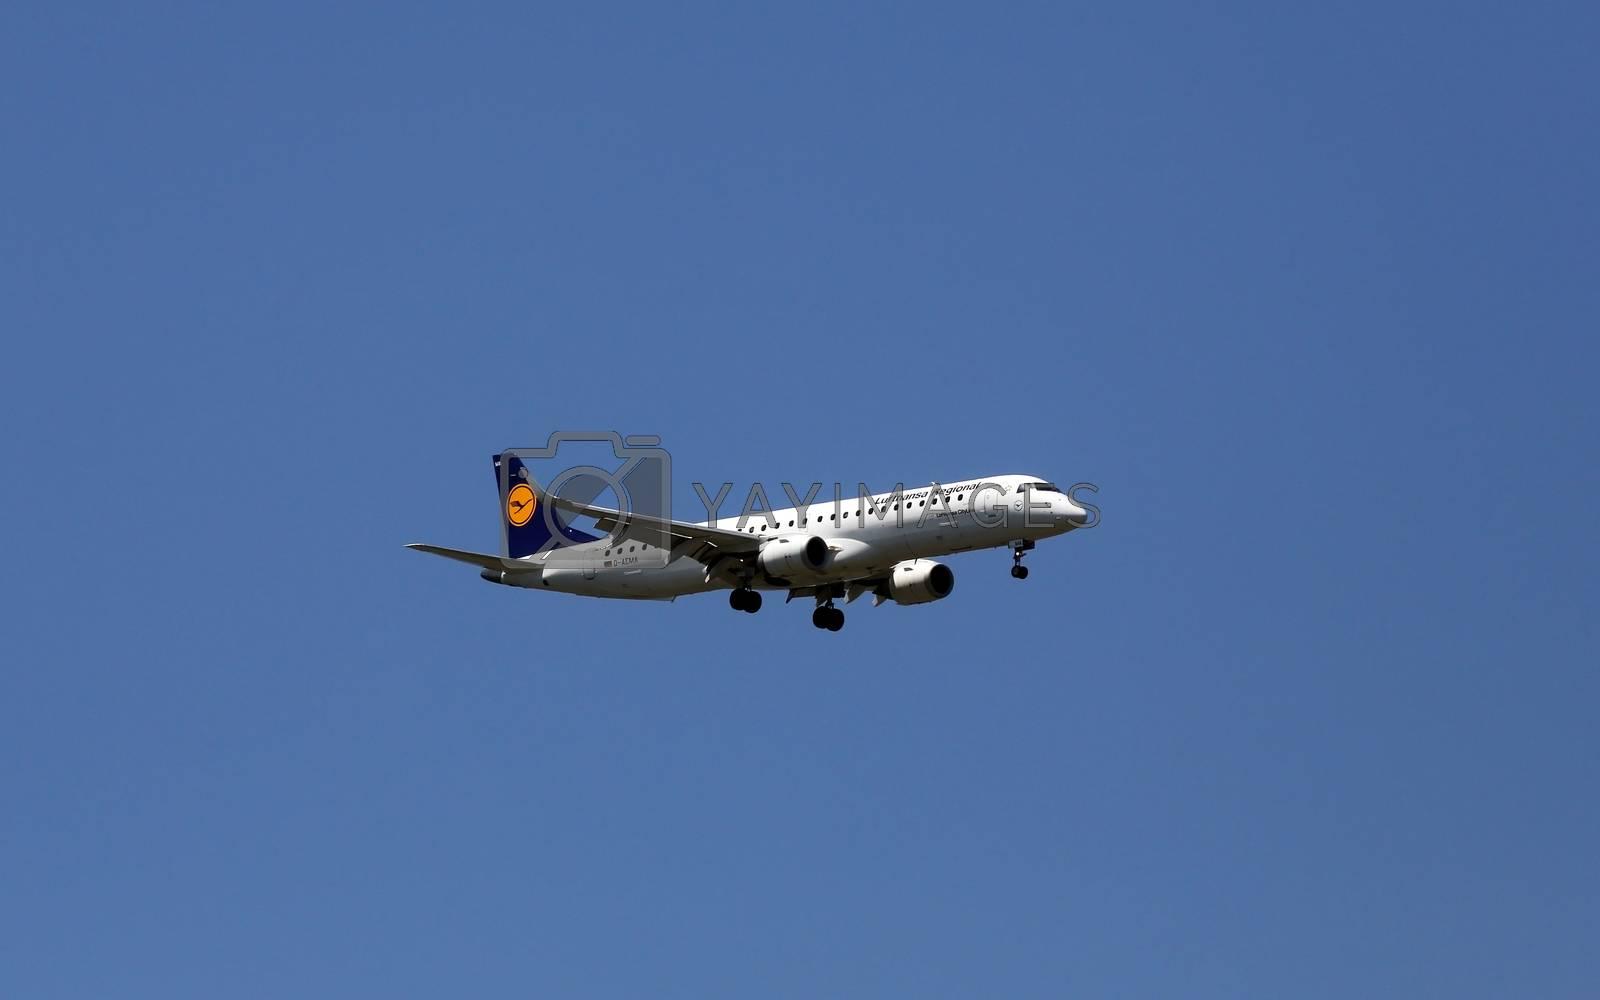 An Embraer ERJ-195, registration D-AEMA of Lufthansa CityLine landing at Zagreb Airport Pleso